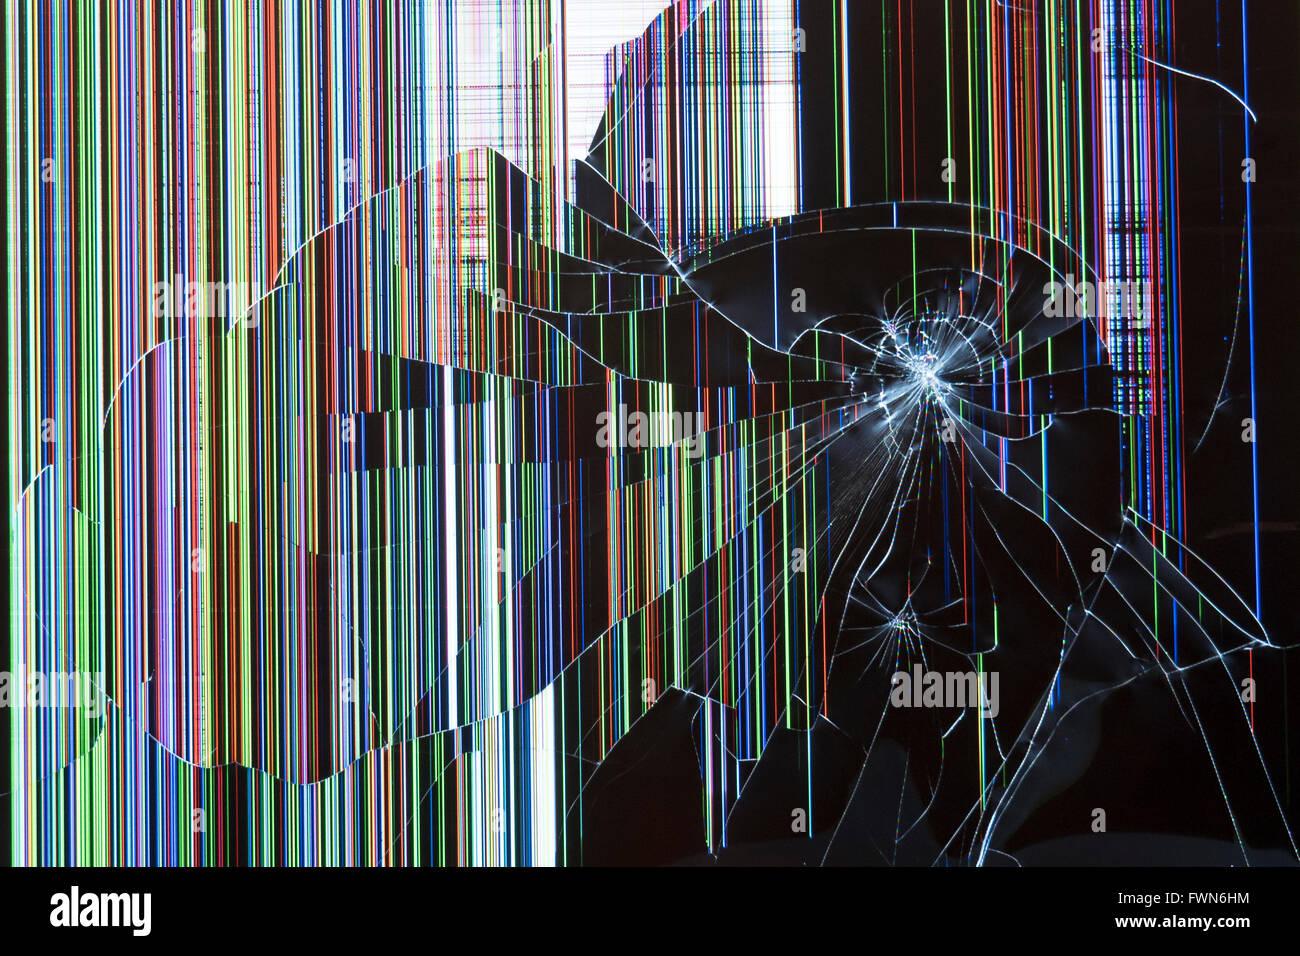 3d Broken Screen Wallpaper Smashed Video Screen Stock Photo 101884432 Alamy